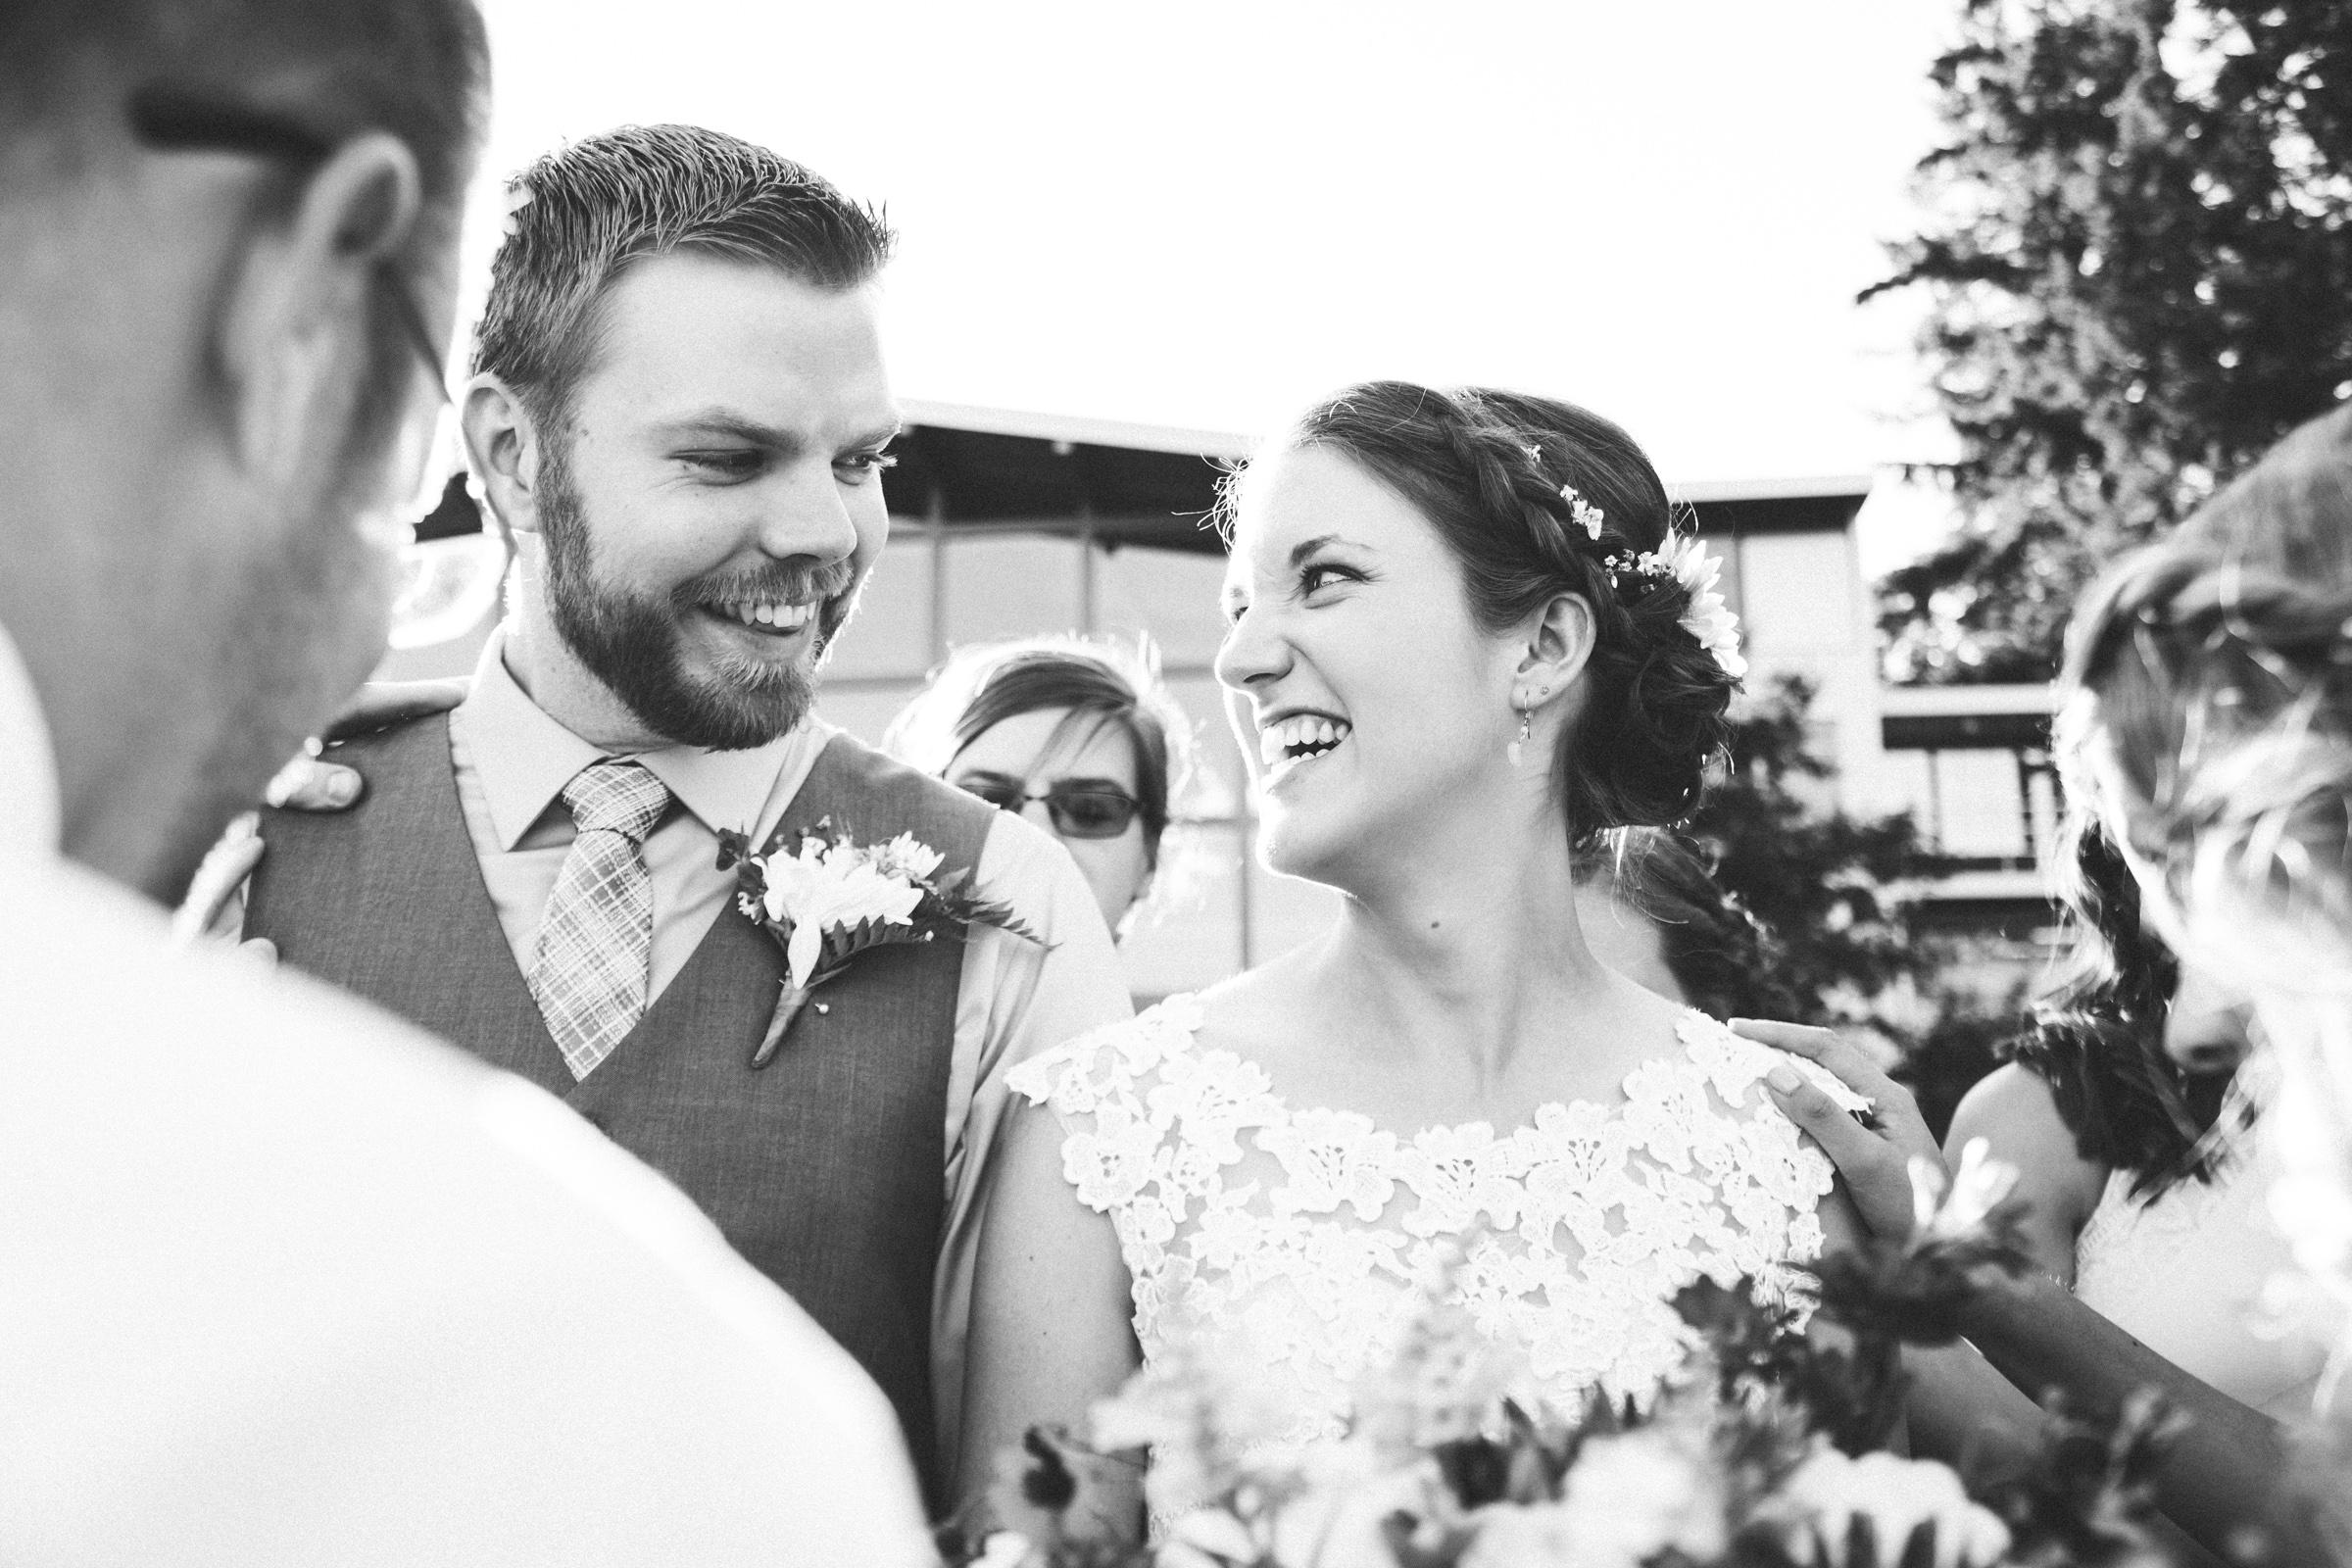 LukeSarah-Seattle-Wedding-080516-0532-2.jpg